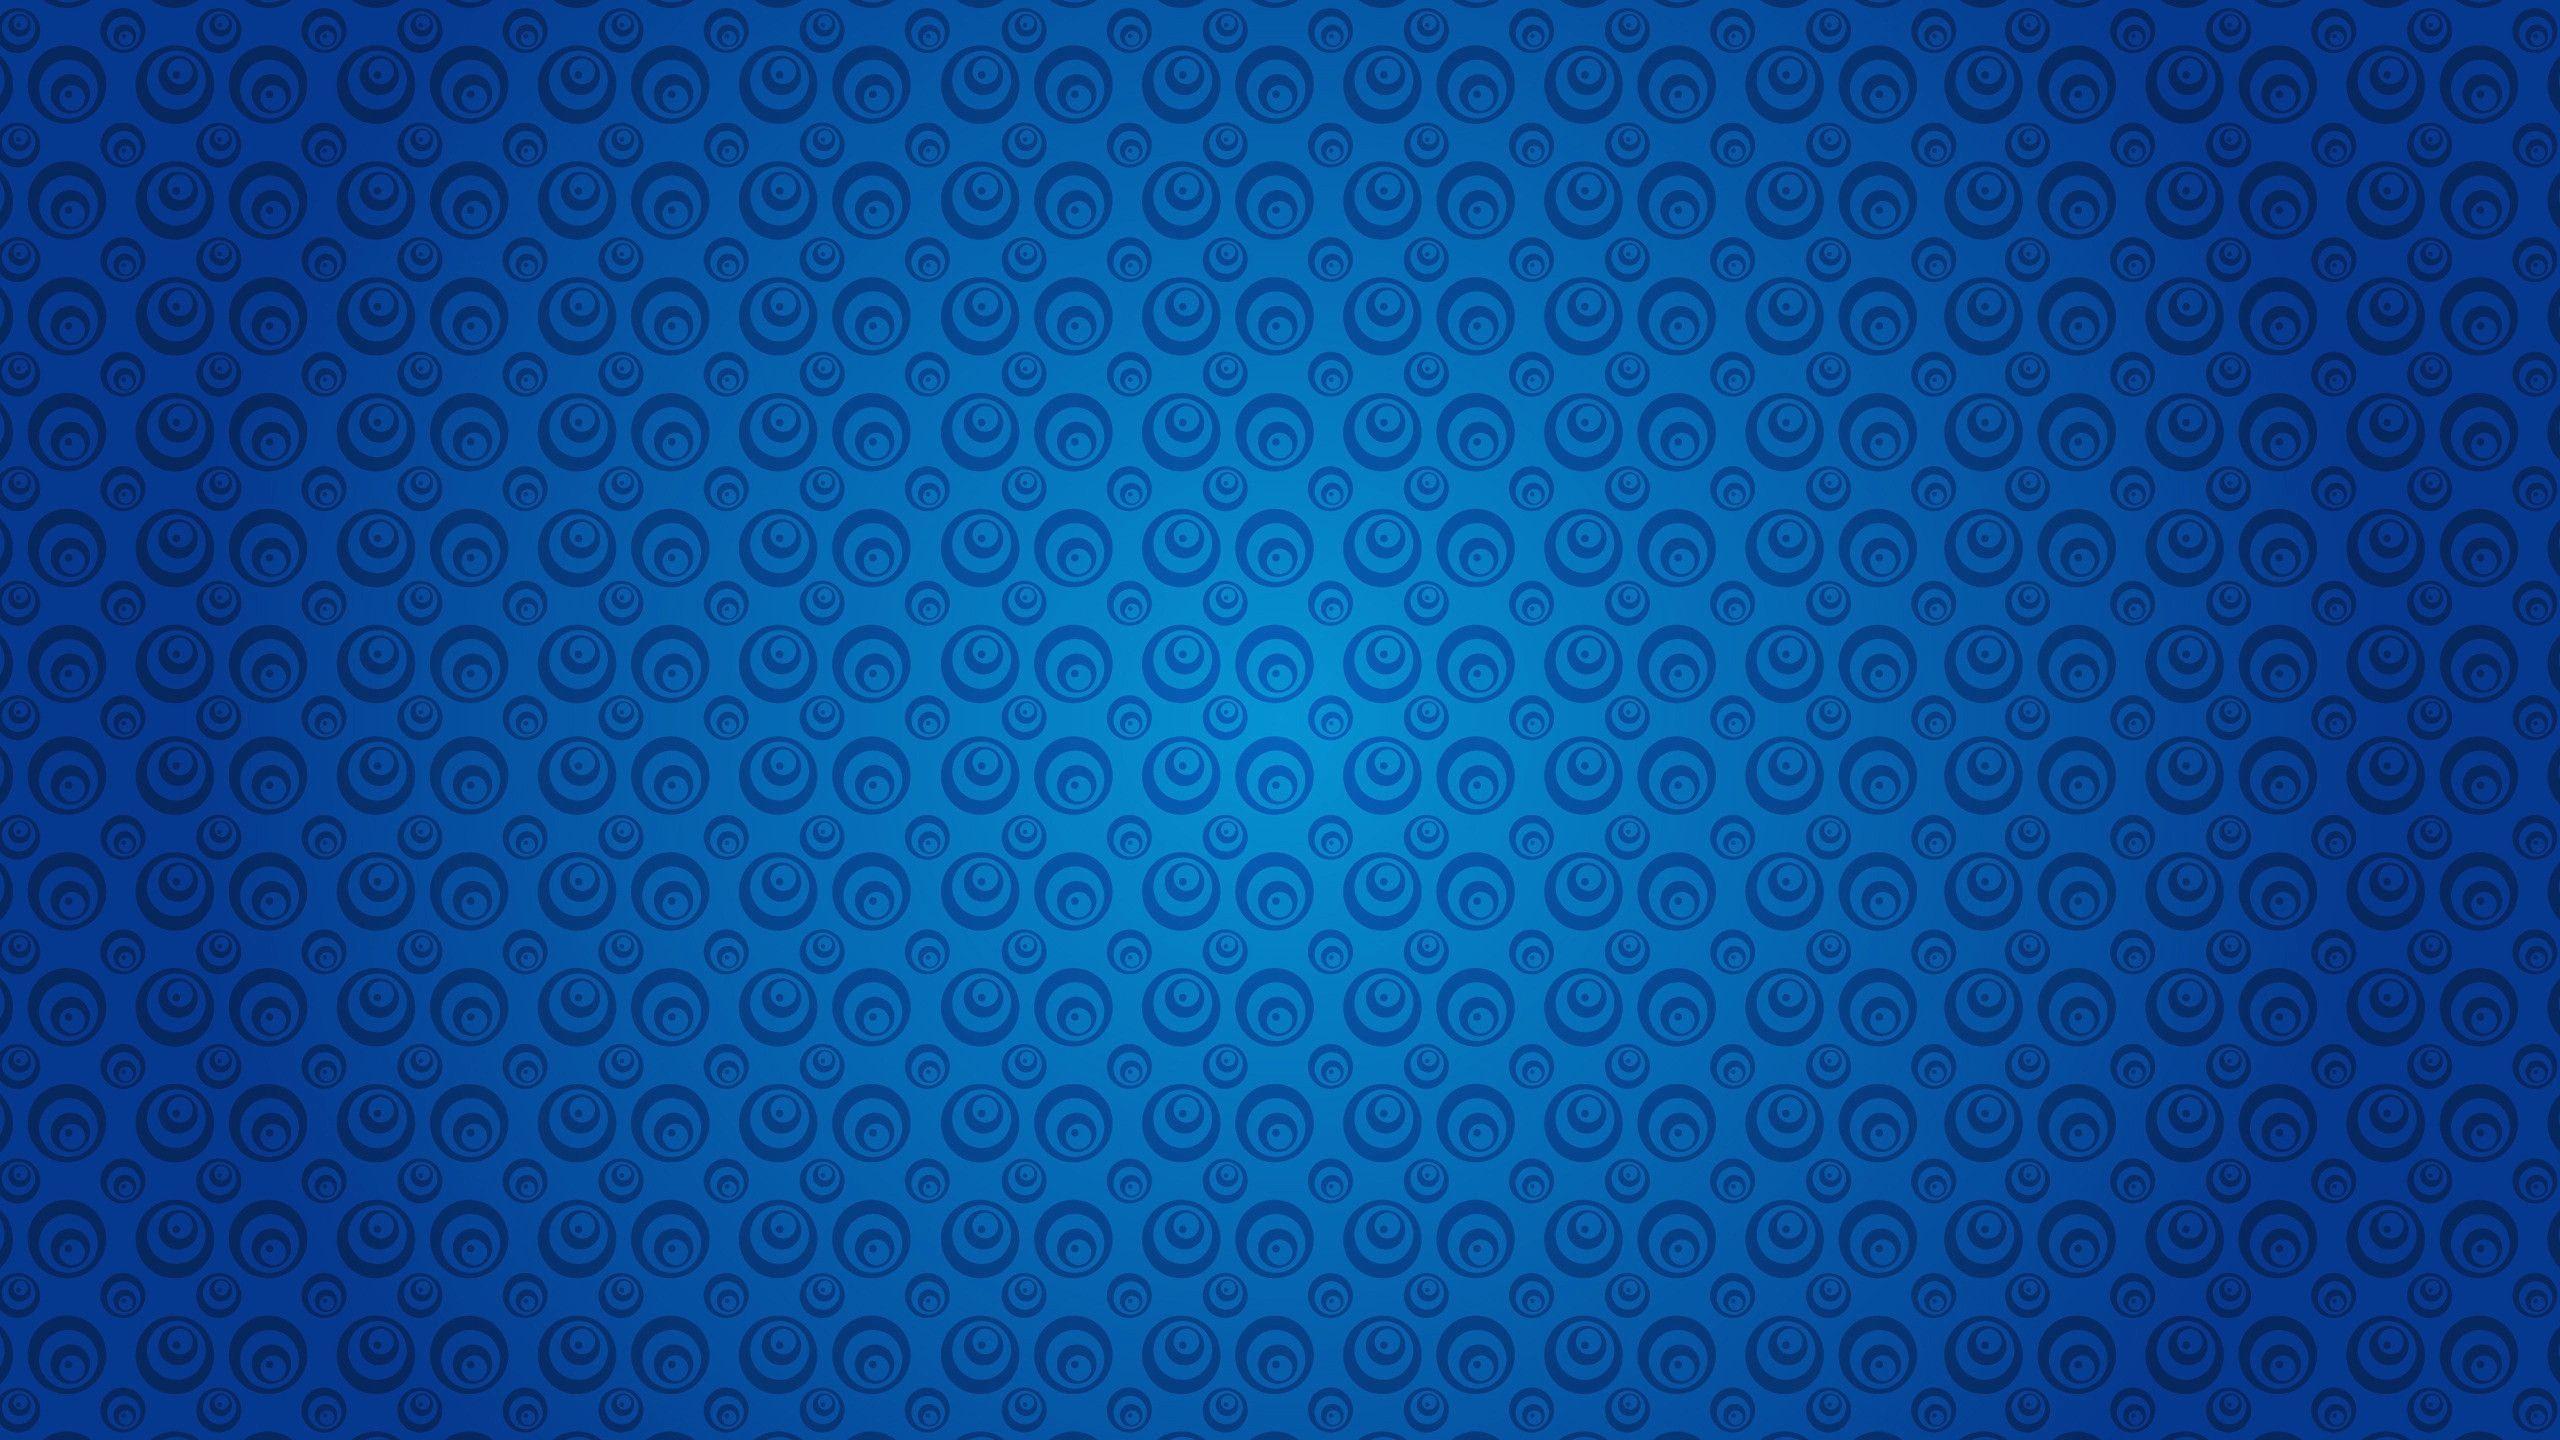 Background Banner Design Hd 10 Check All Also Transitionsfv Avec Background Banner Design Hd 10 Blue Background Patterns Background Patterns Background Design